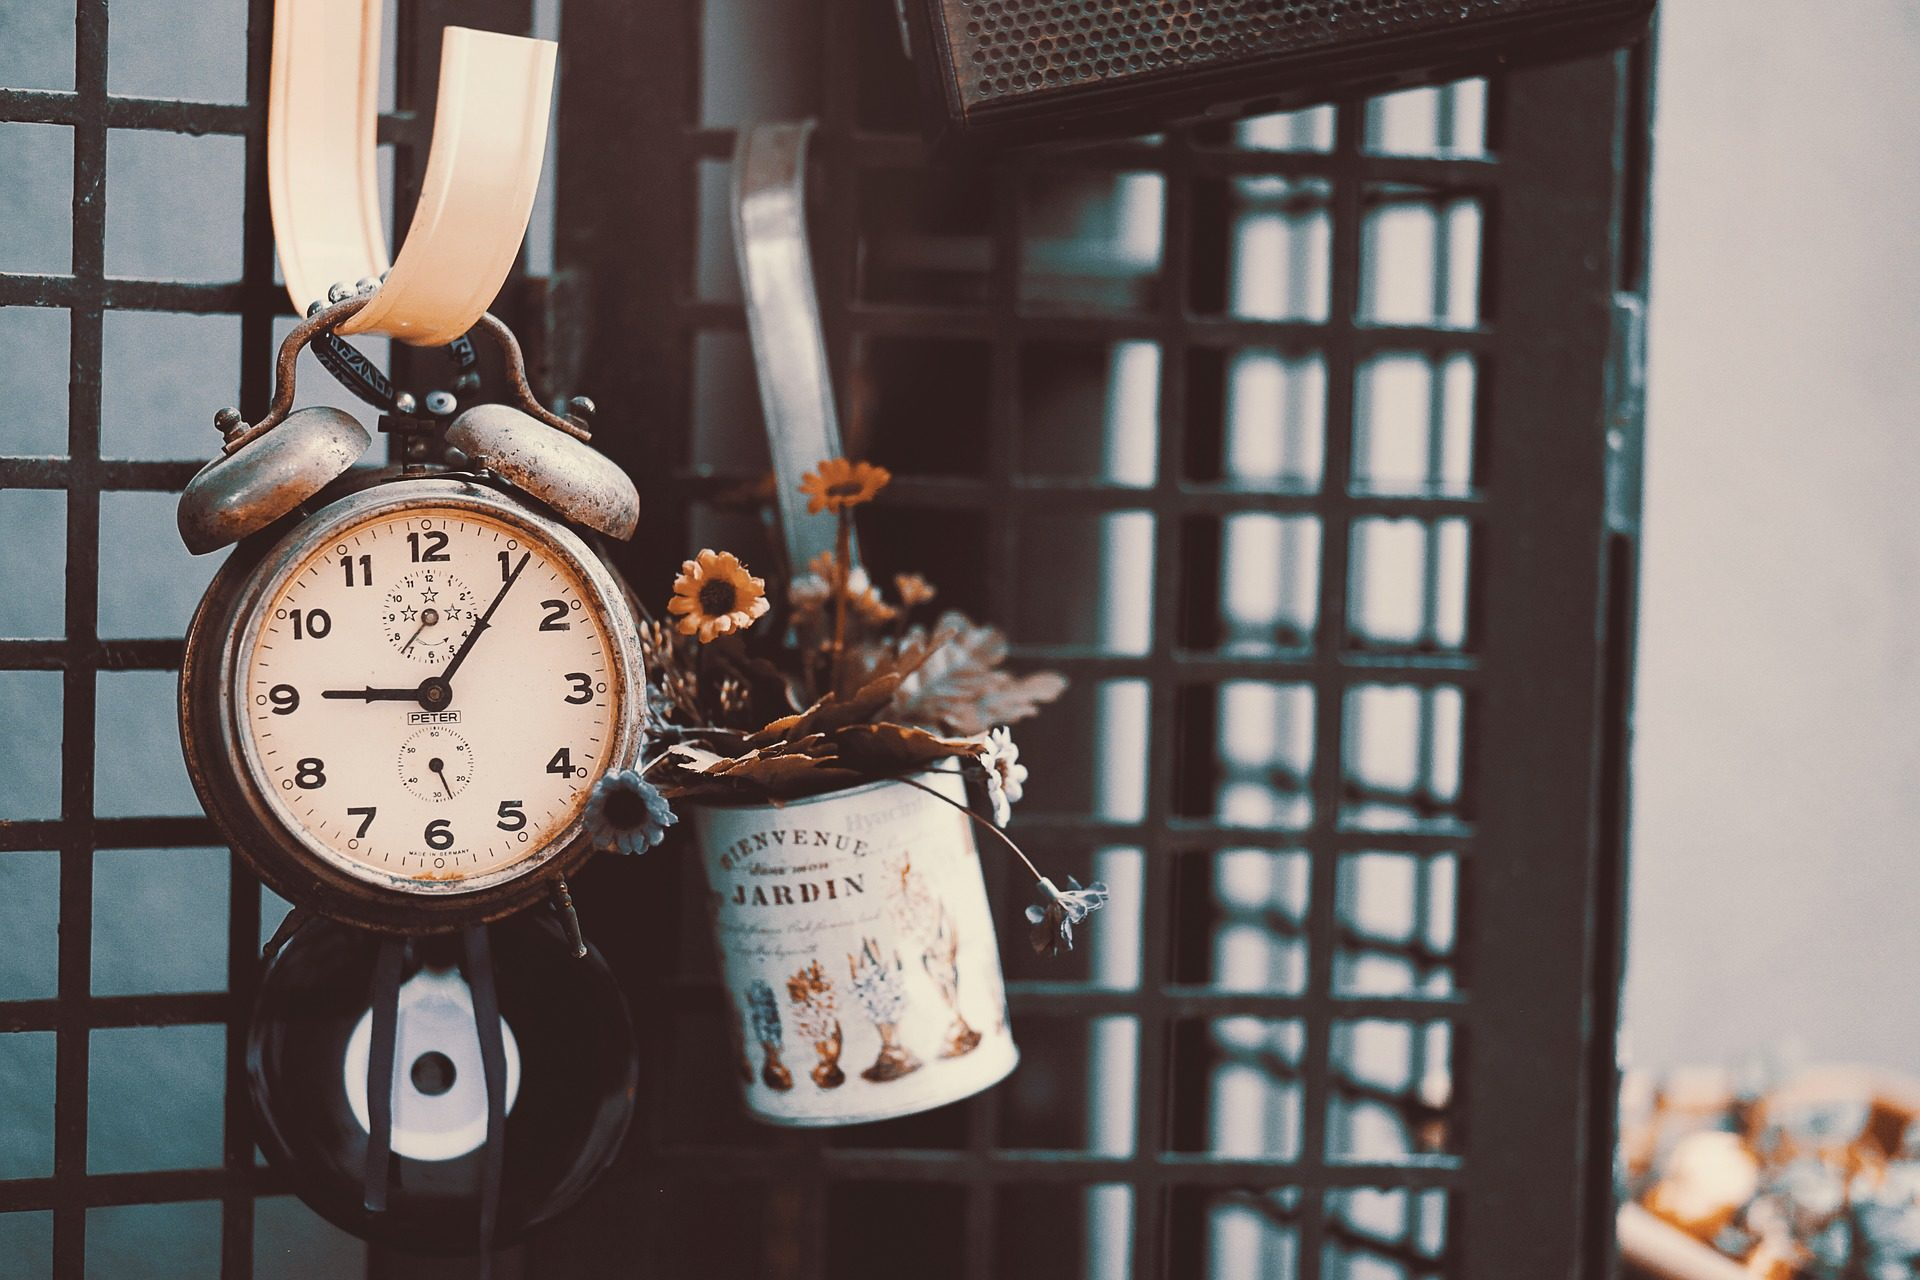 Uhr, Wecker, Topf, Zinn, Recycling, Retro, Jahrgang - Wallpaper HD - Prof.-falken.com